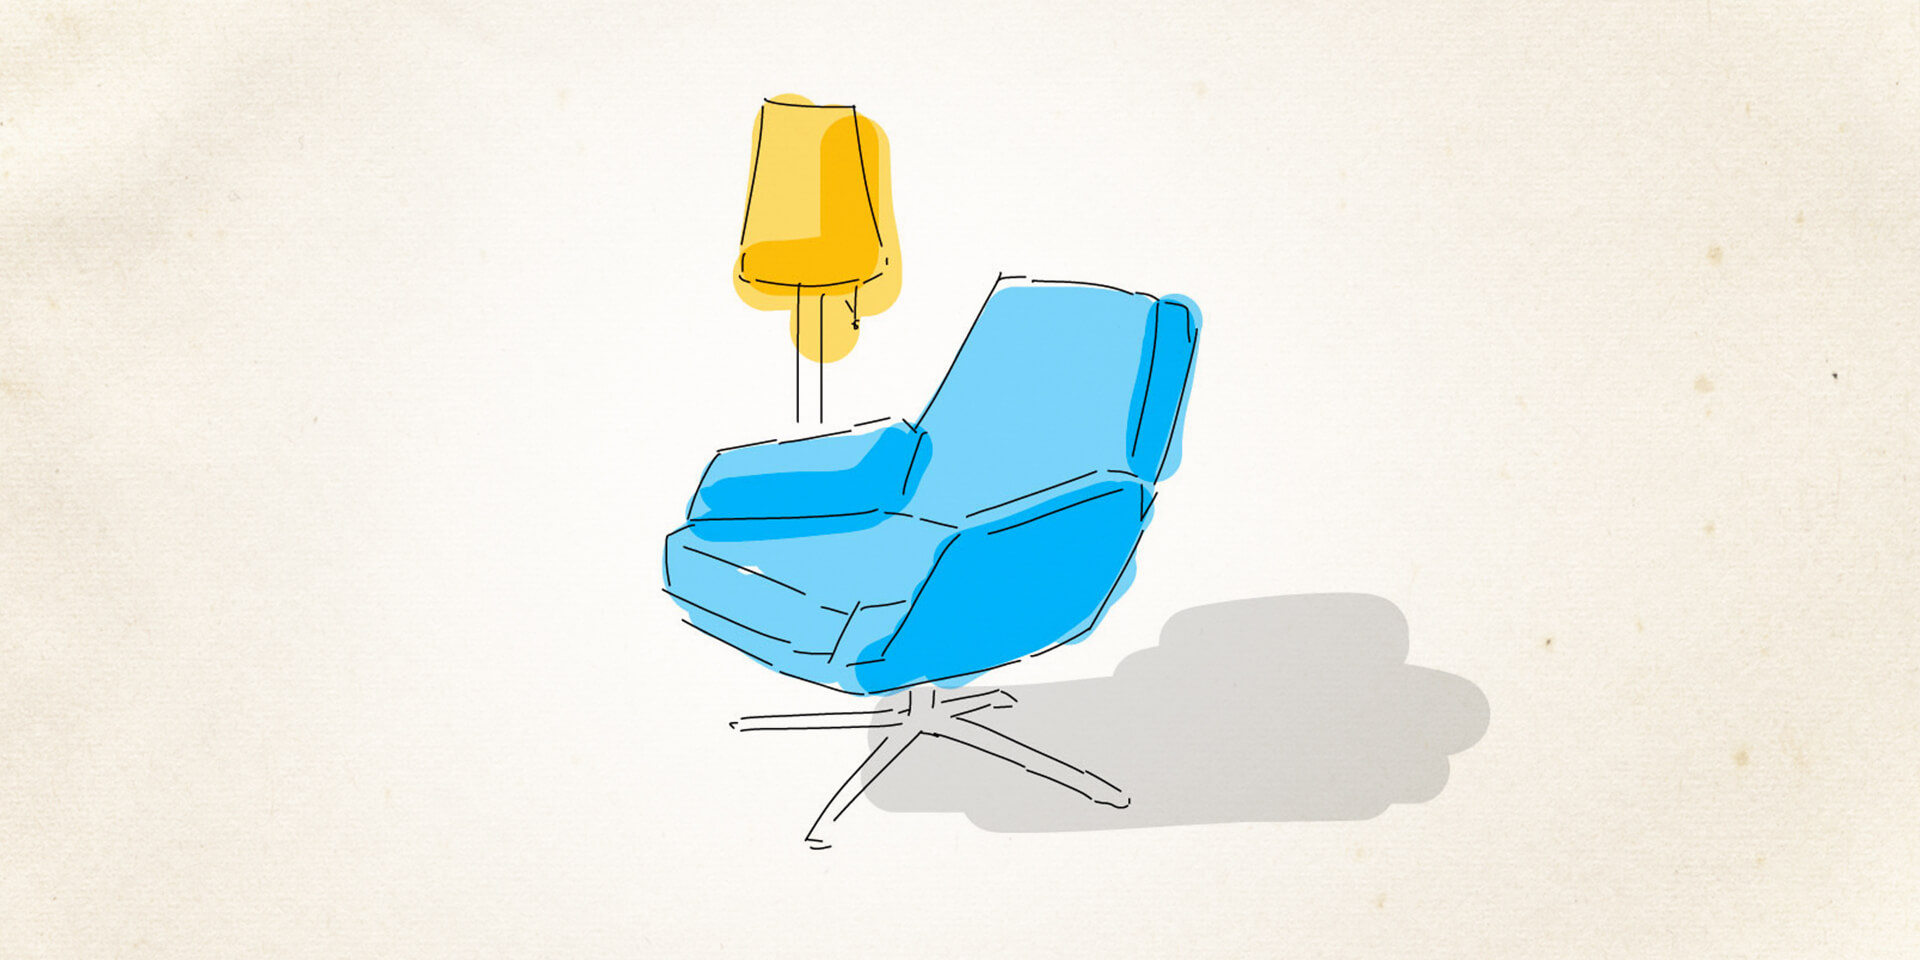 Sessel und Lampe